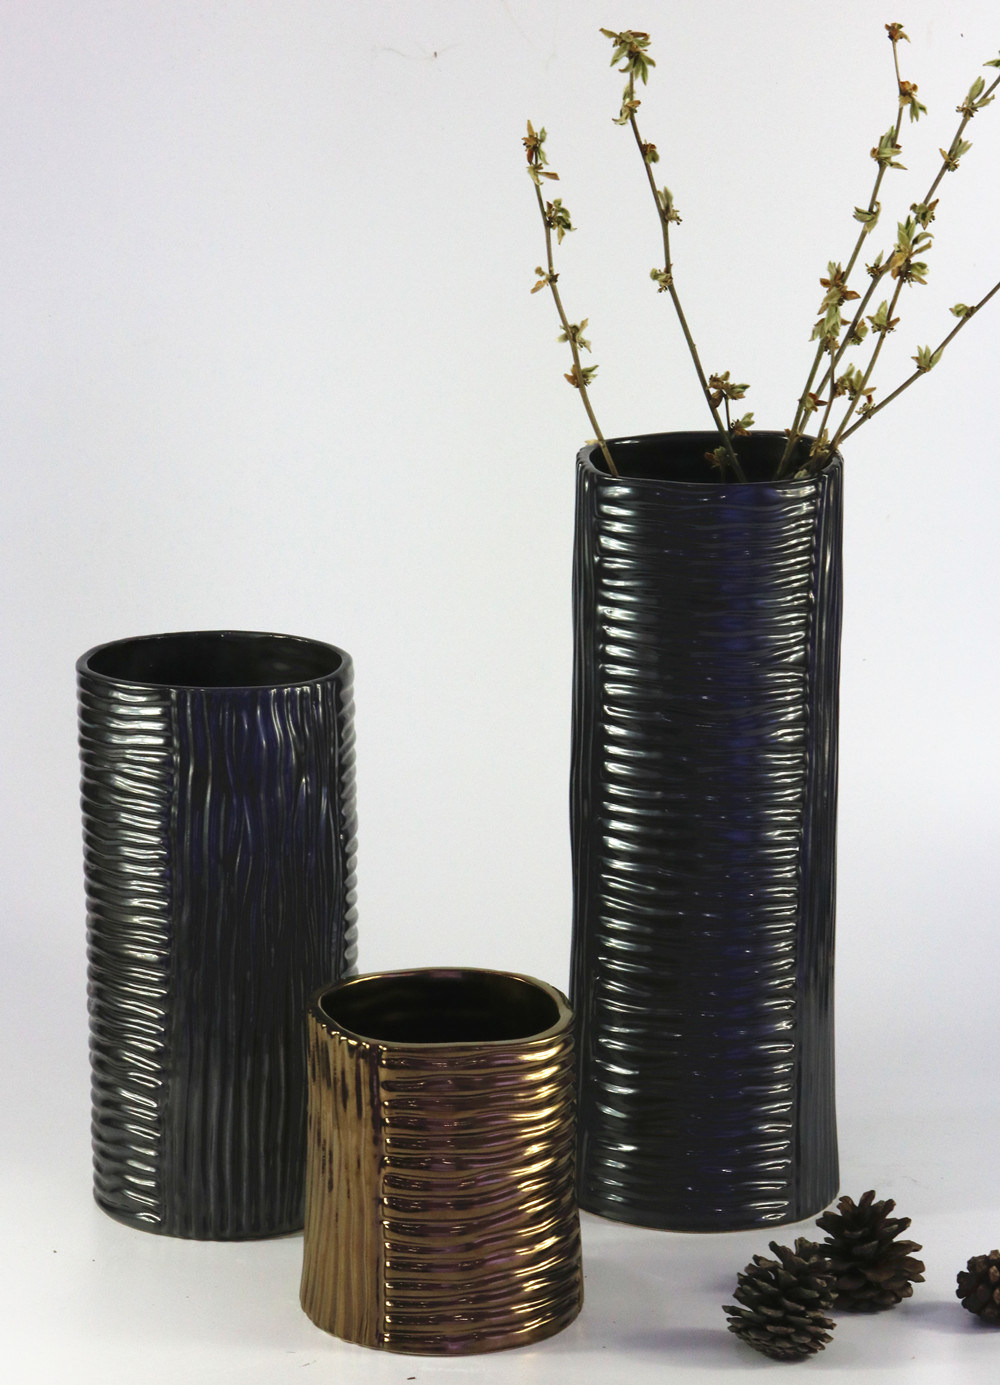 Straight Type Glazed Fashion Ceramic Handicrafts